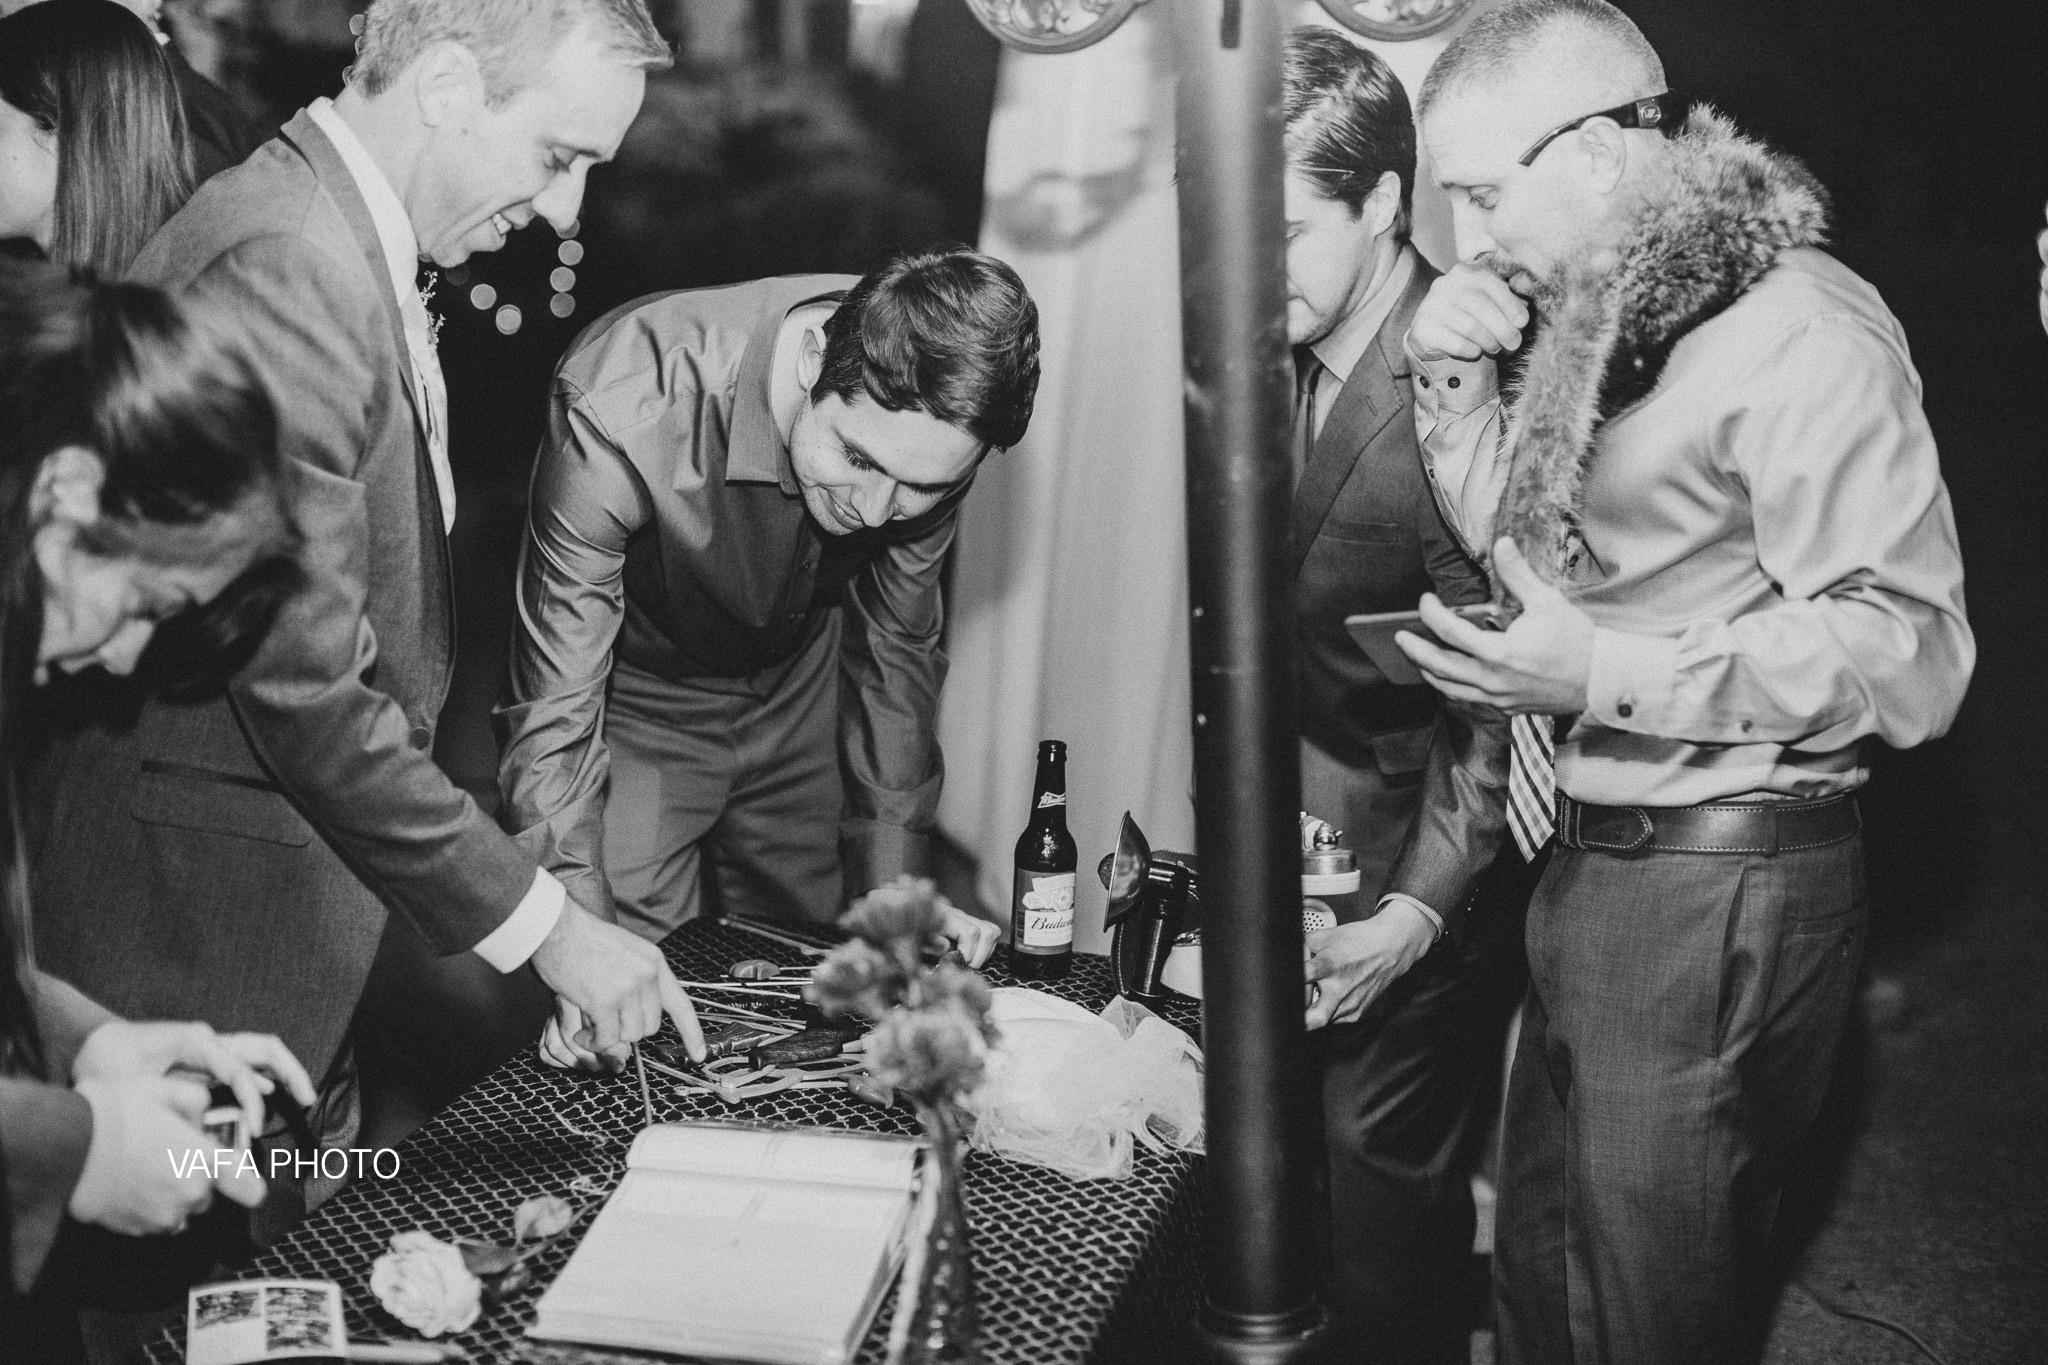 Leo-Carrillo-Ranch-Wedding-Lauren-Mike-Vafa-Photo-1080.jpg